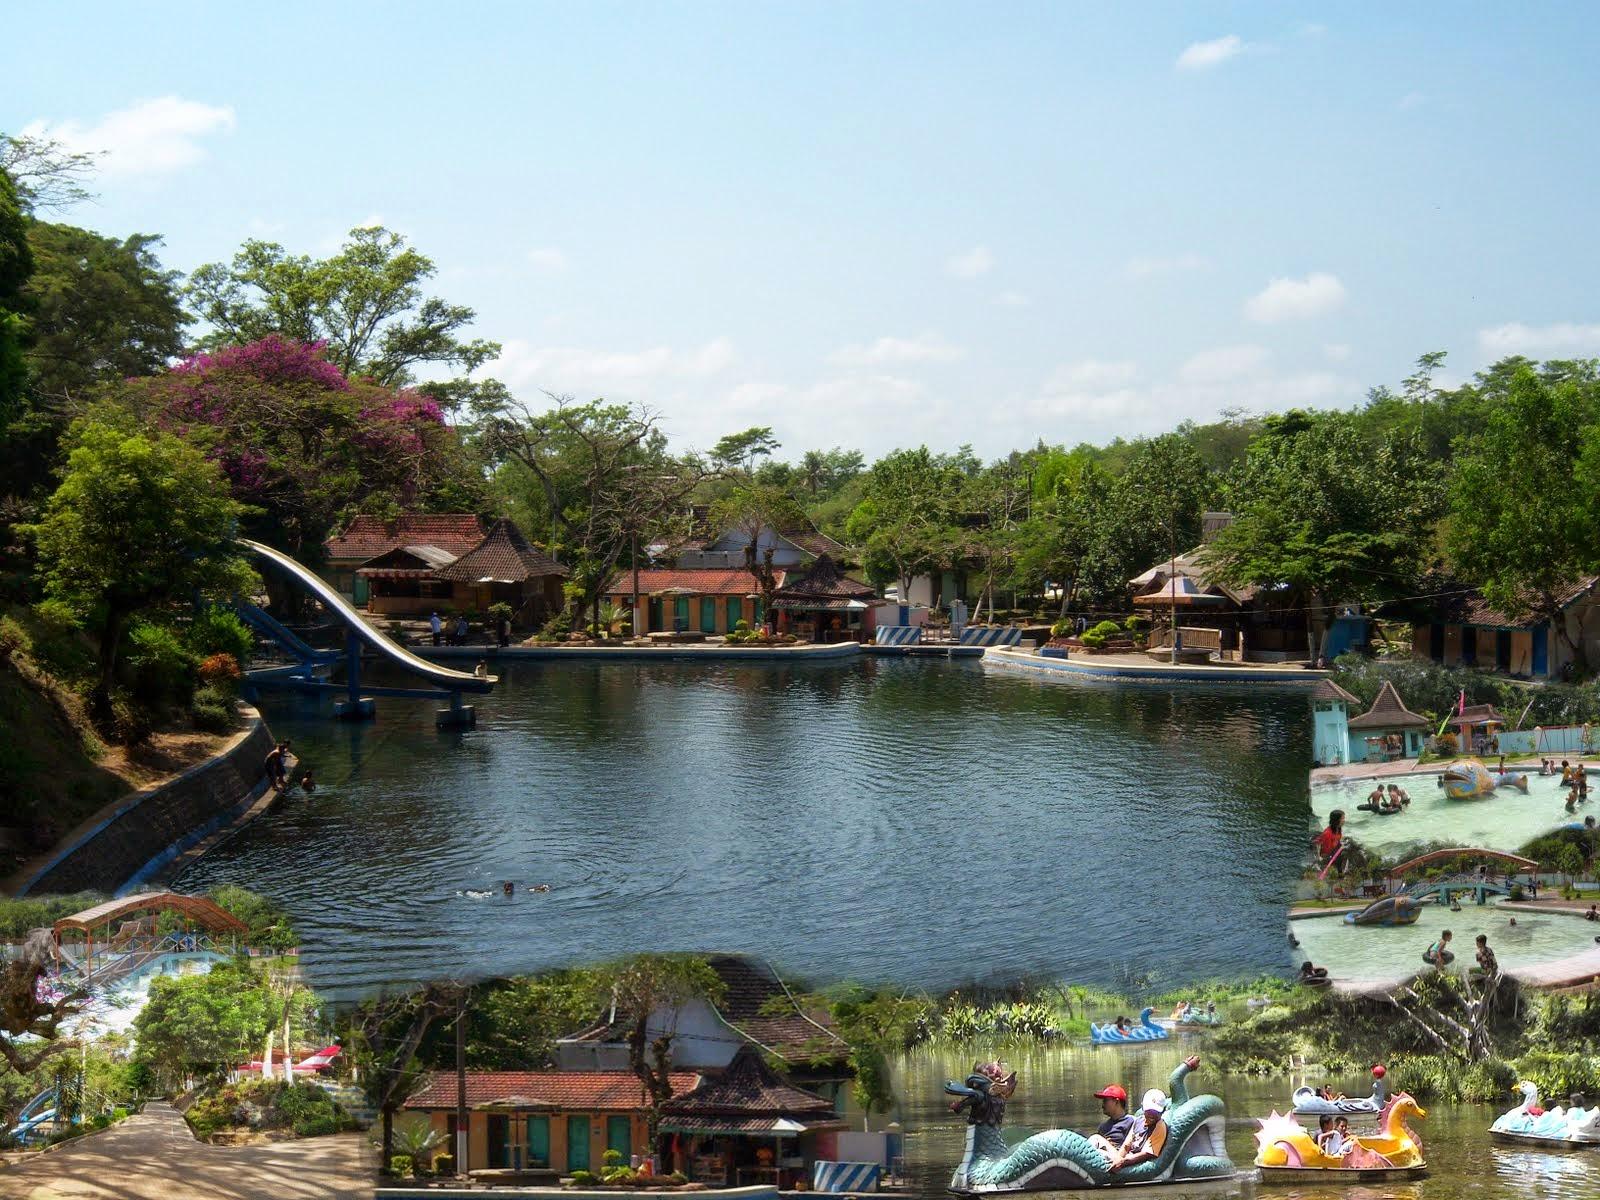 Daftar Tempat Wisata Di Lumajang Jawa Timur Yang Menarik